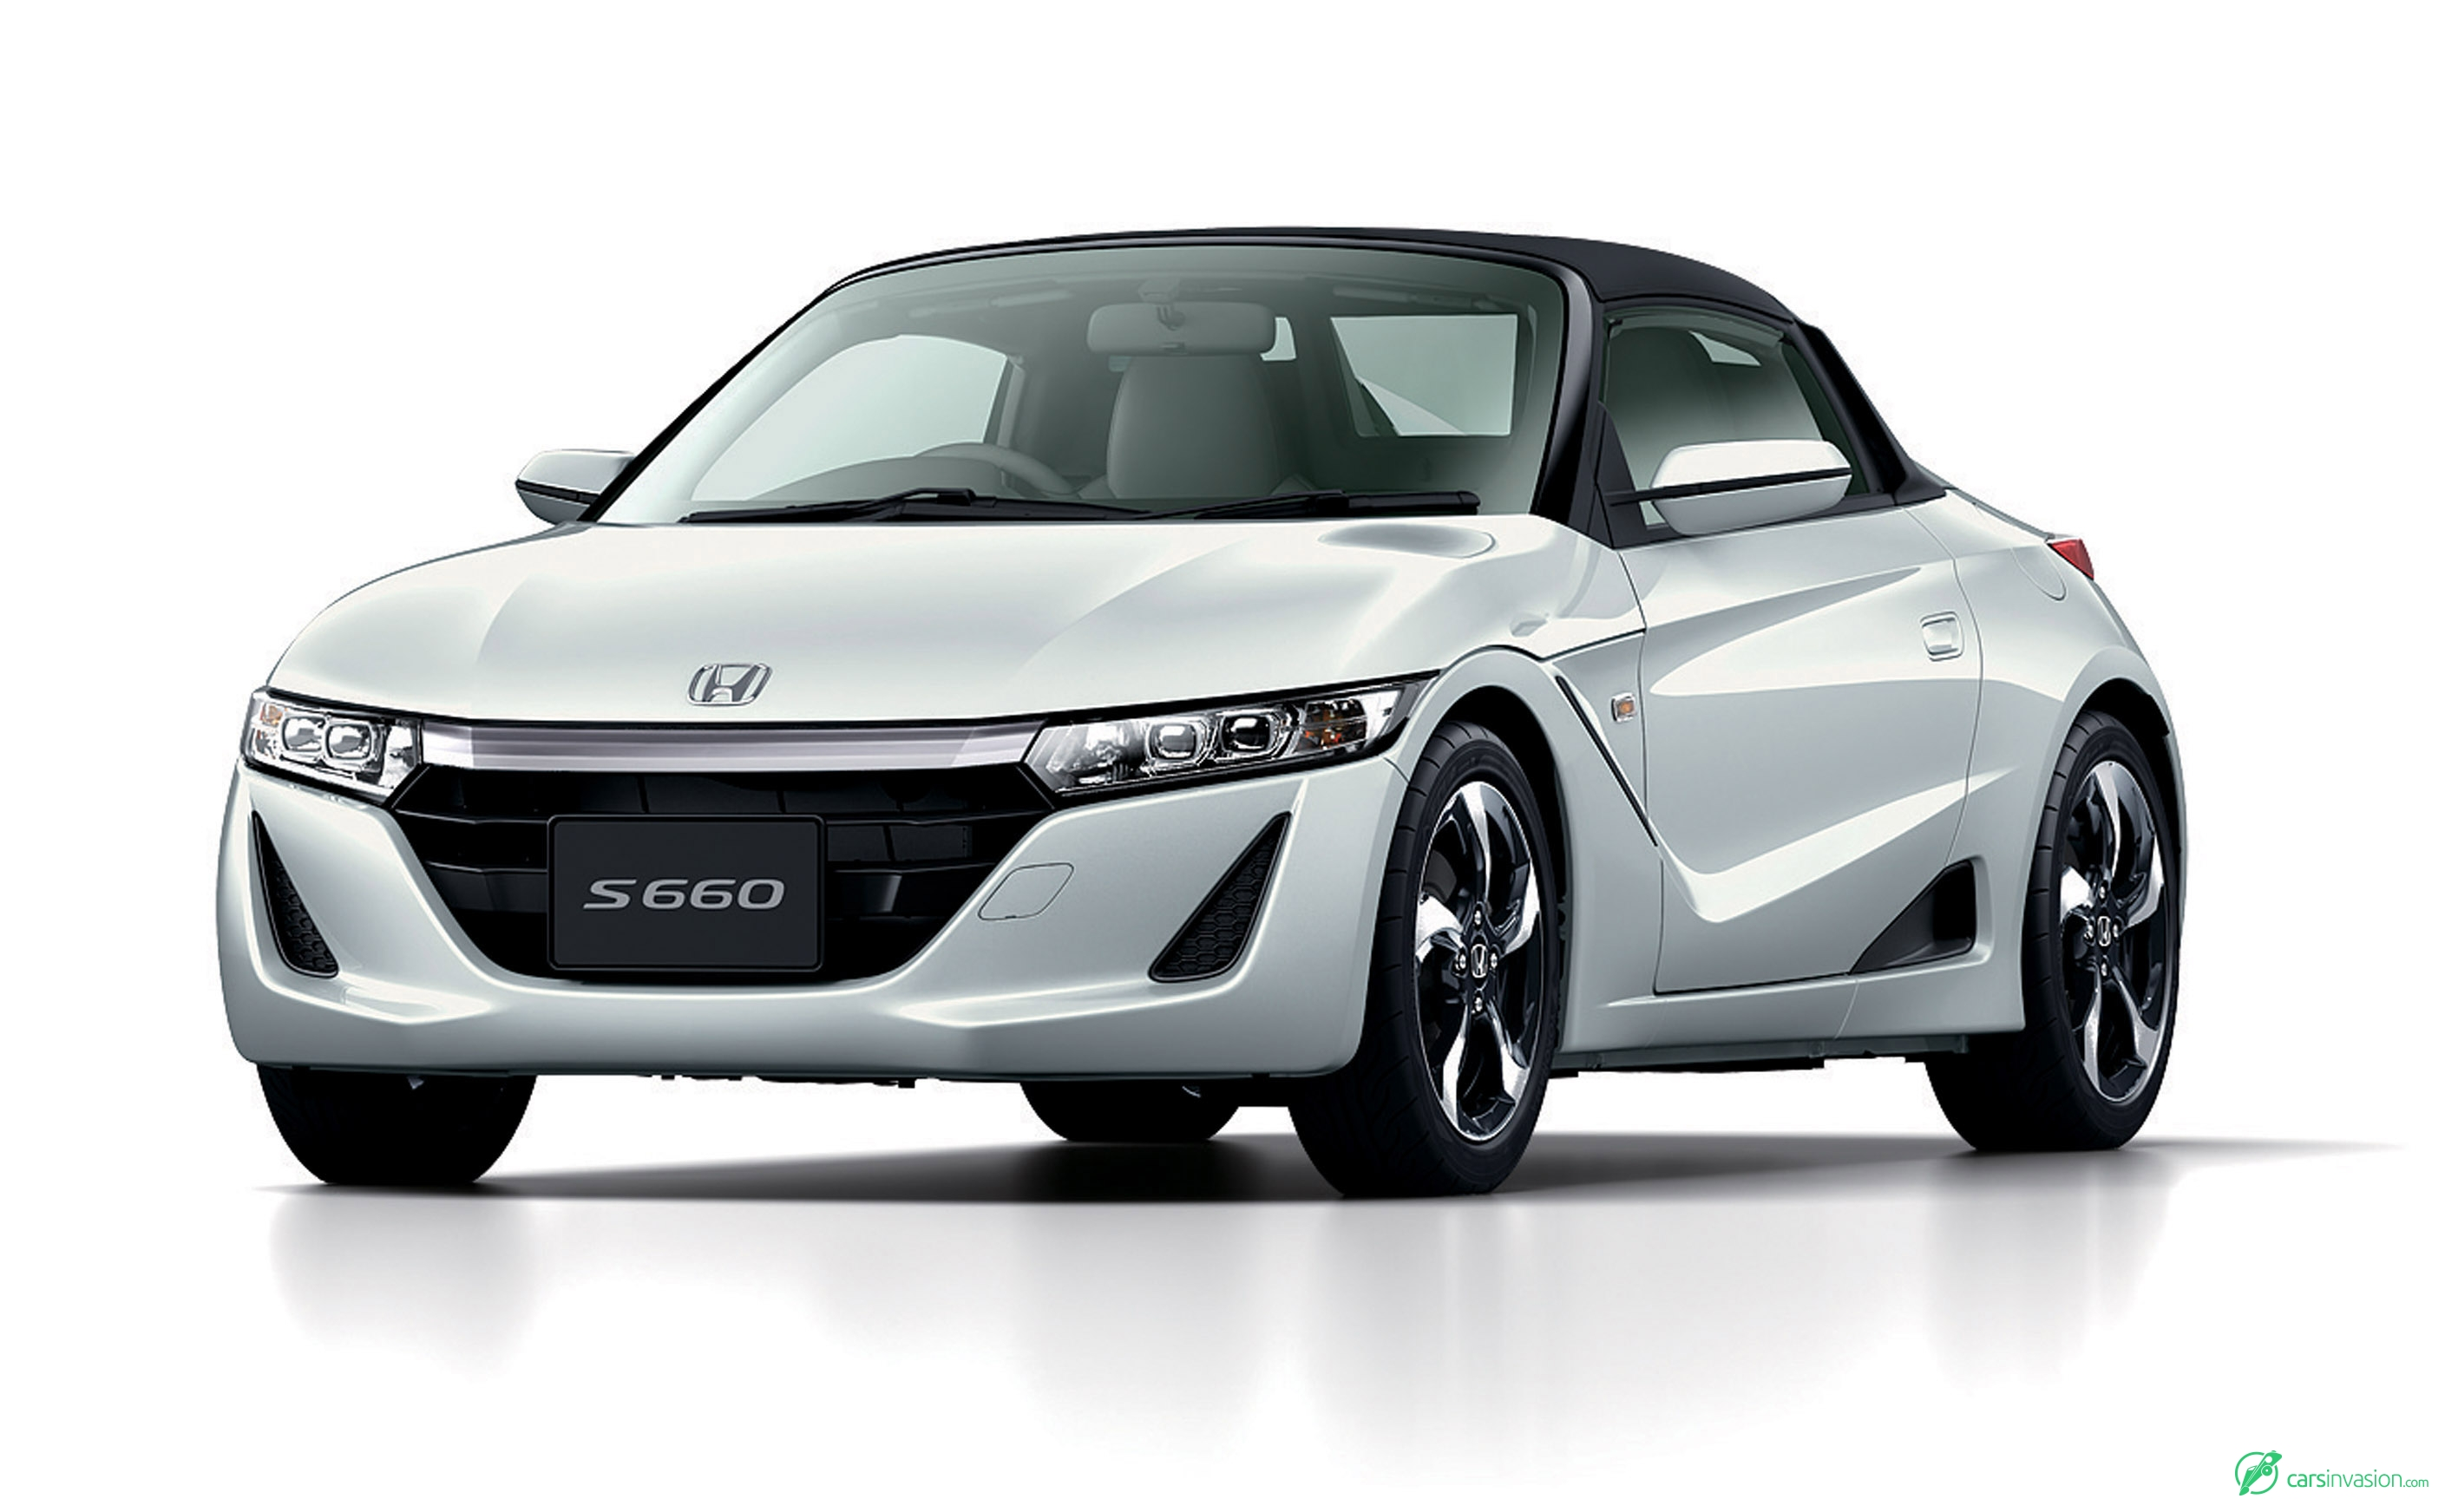 2015 Honda S660 Concept Edition Hd Pictures Carsinvasion Com